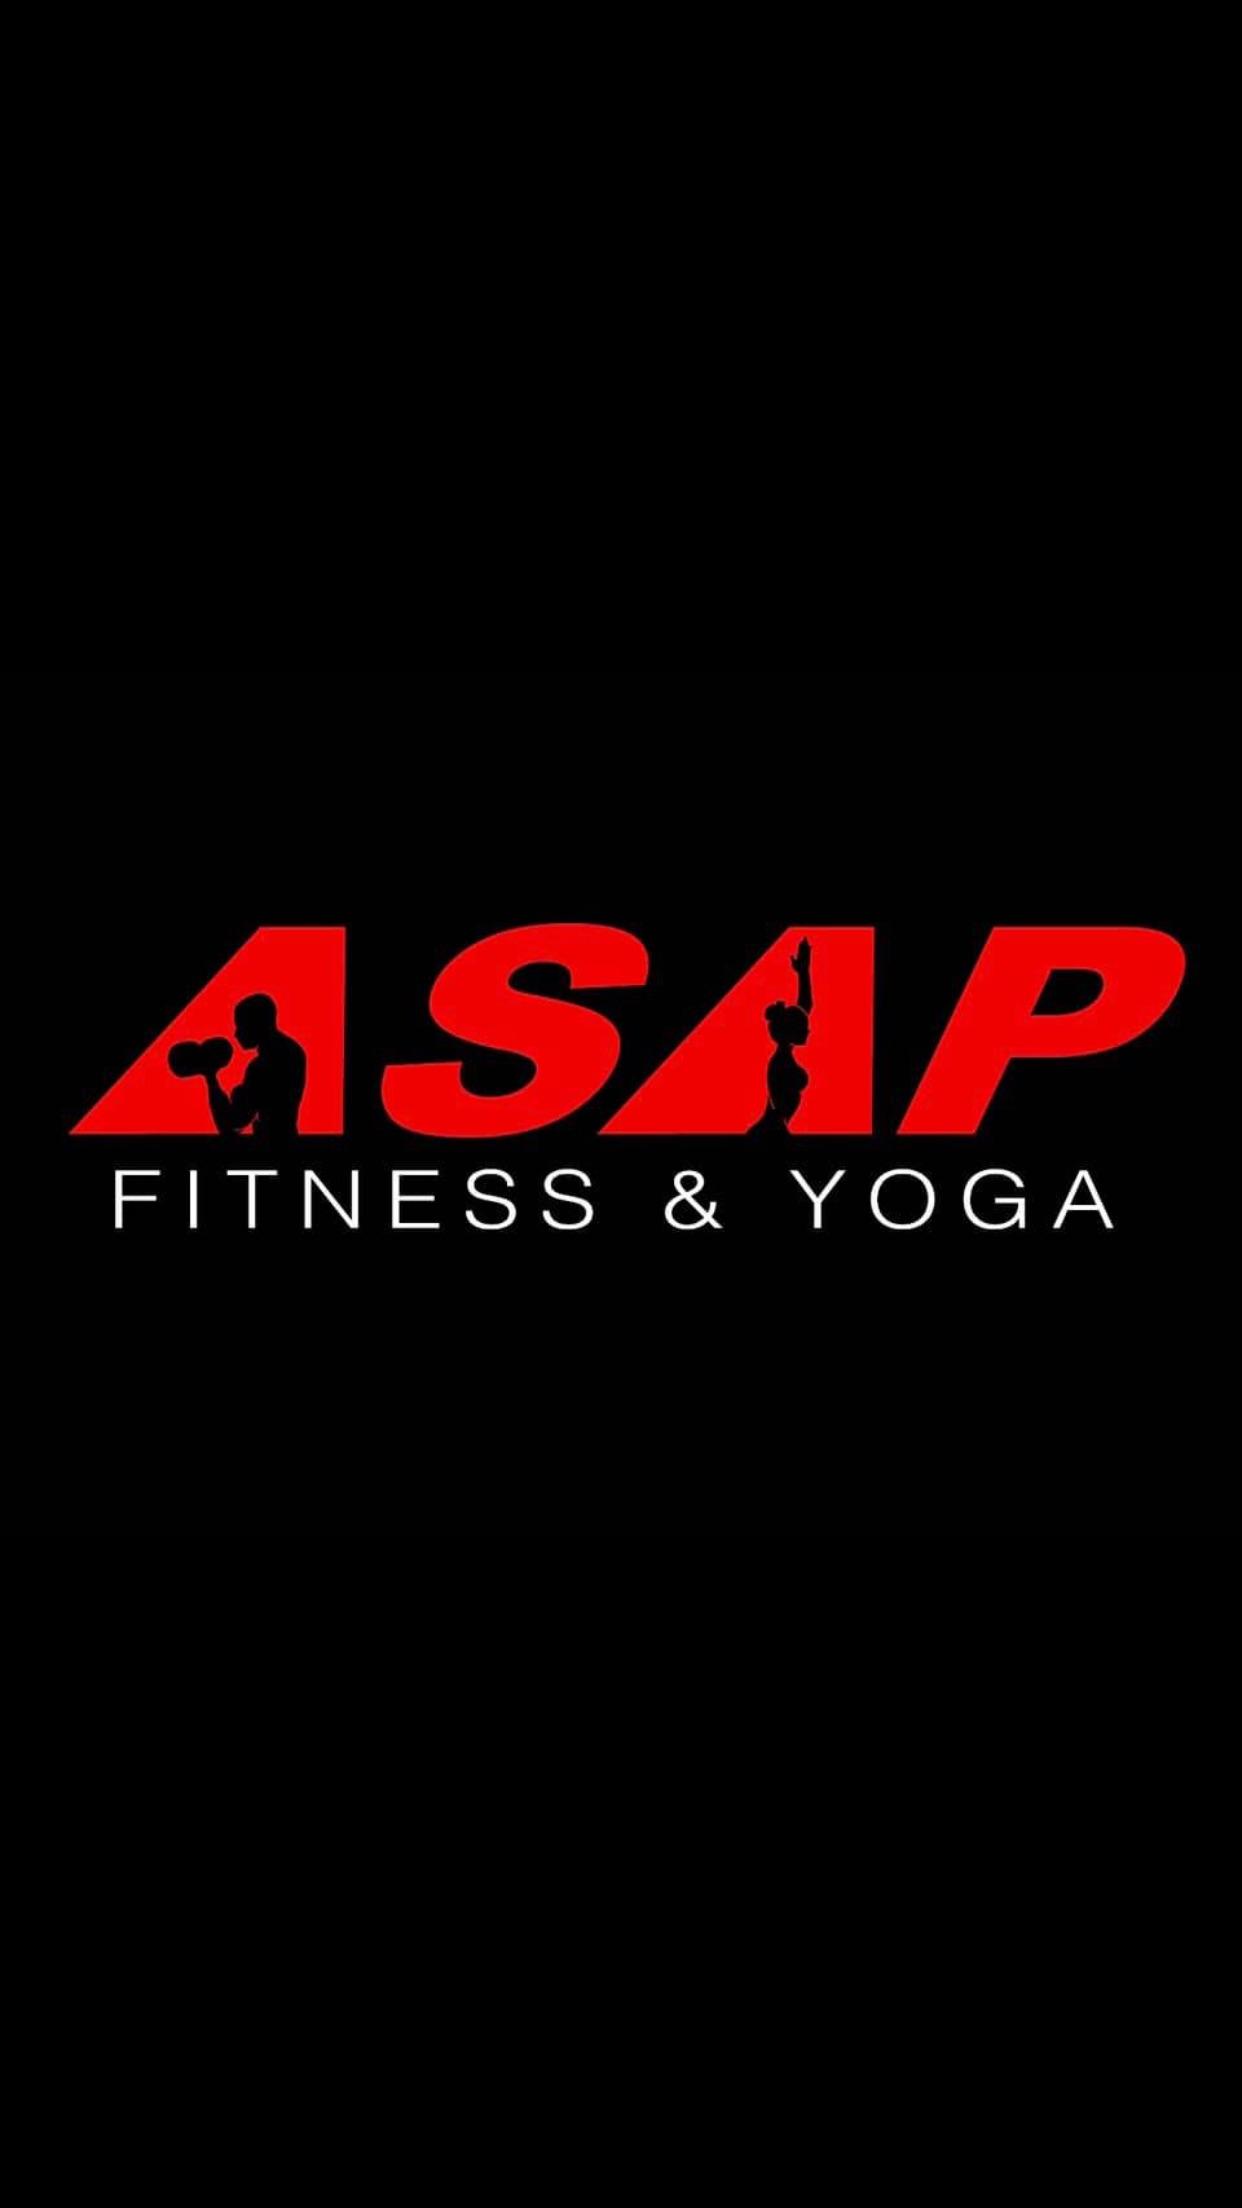 ASAP Fitness & Yoga